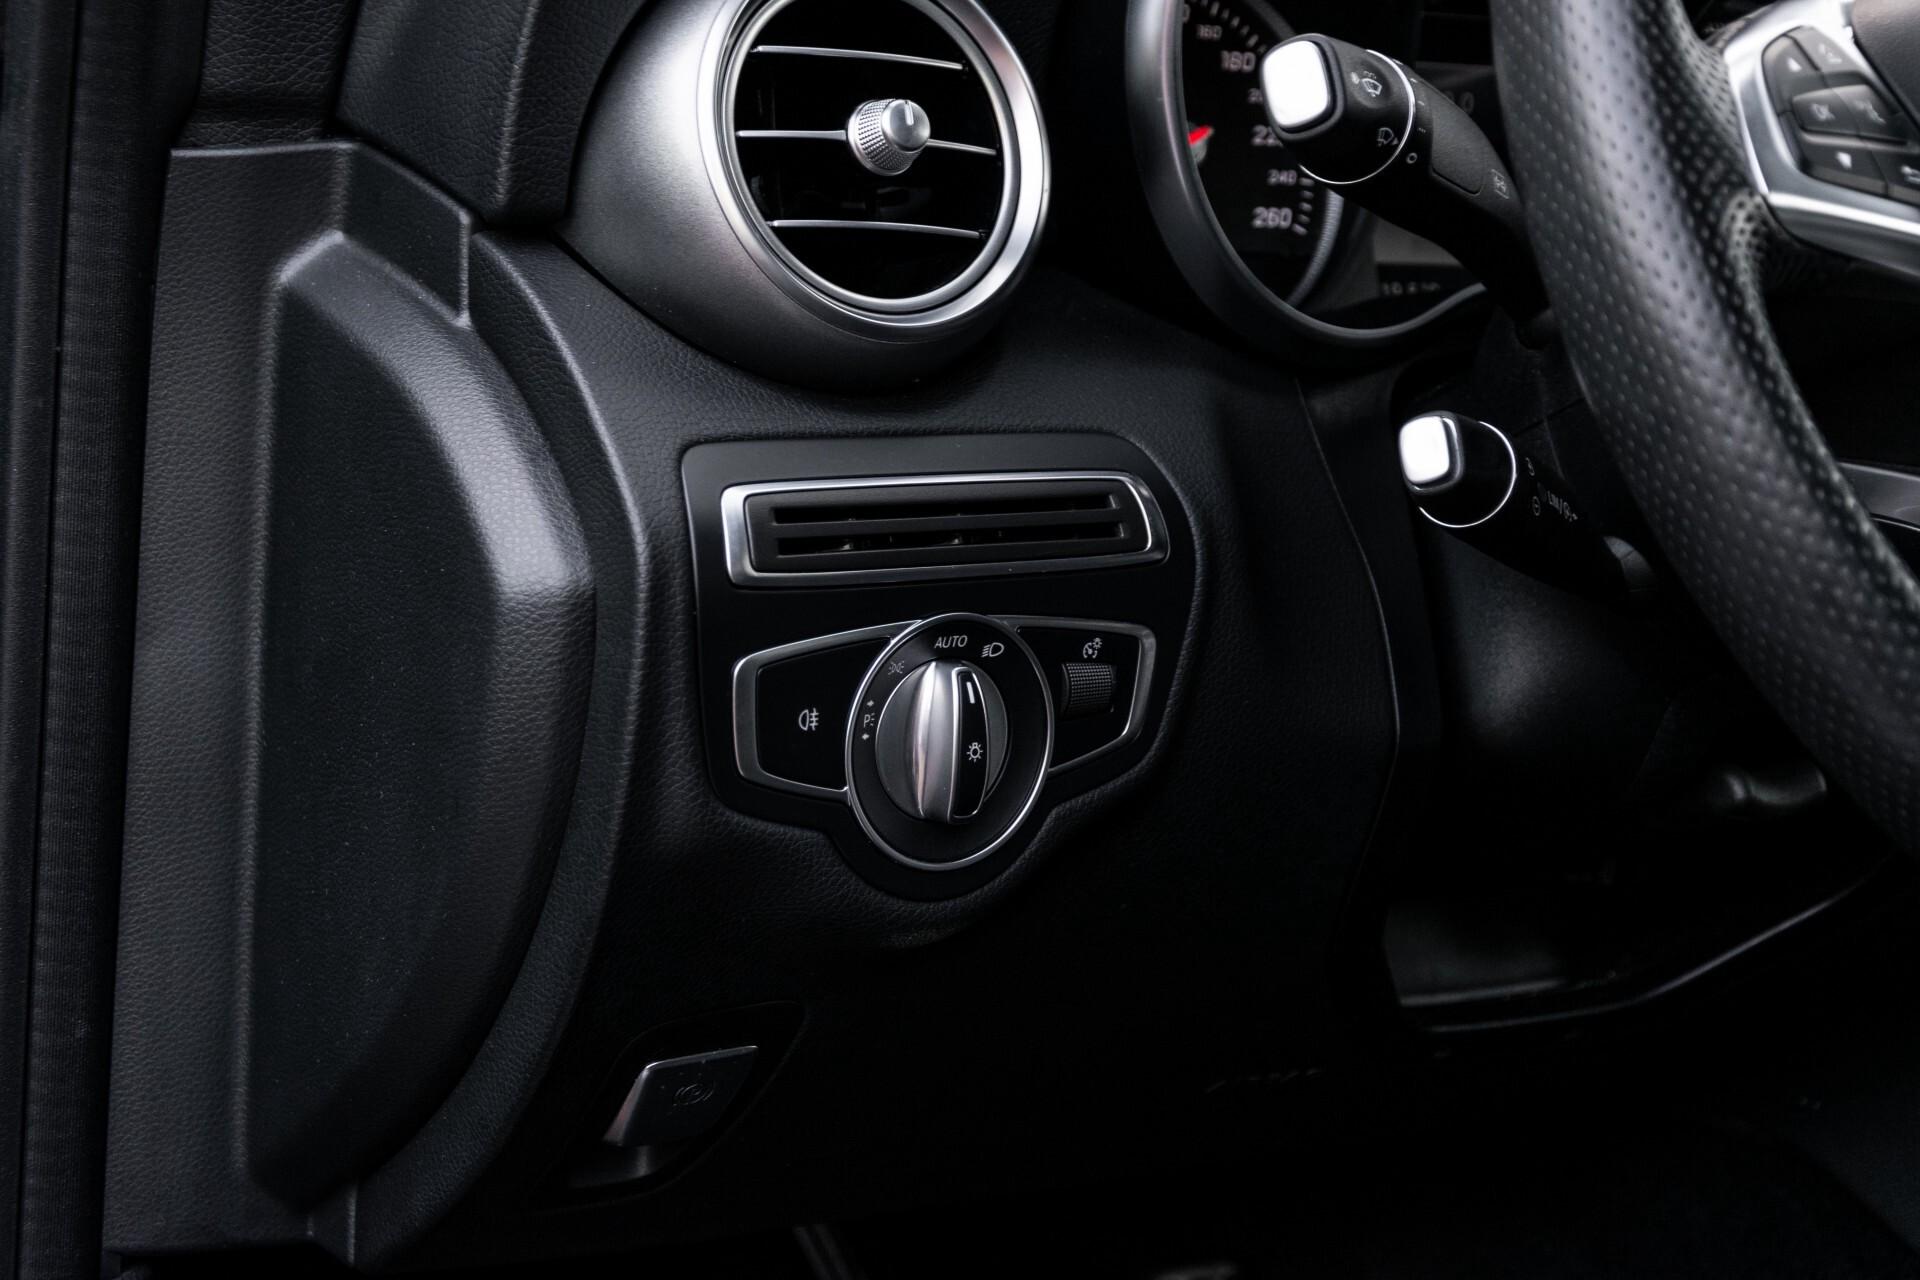 Mercedes-Benz C-Klasse Cabrio 250 AMG Airscarf/Aircap/Comand/ILS/Camera/Rode cabriokap Aut9 Foto 30